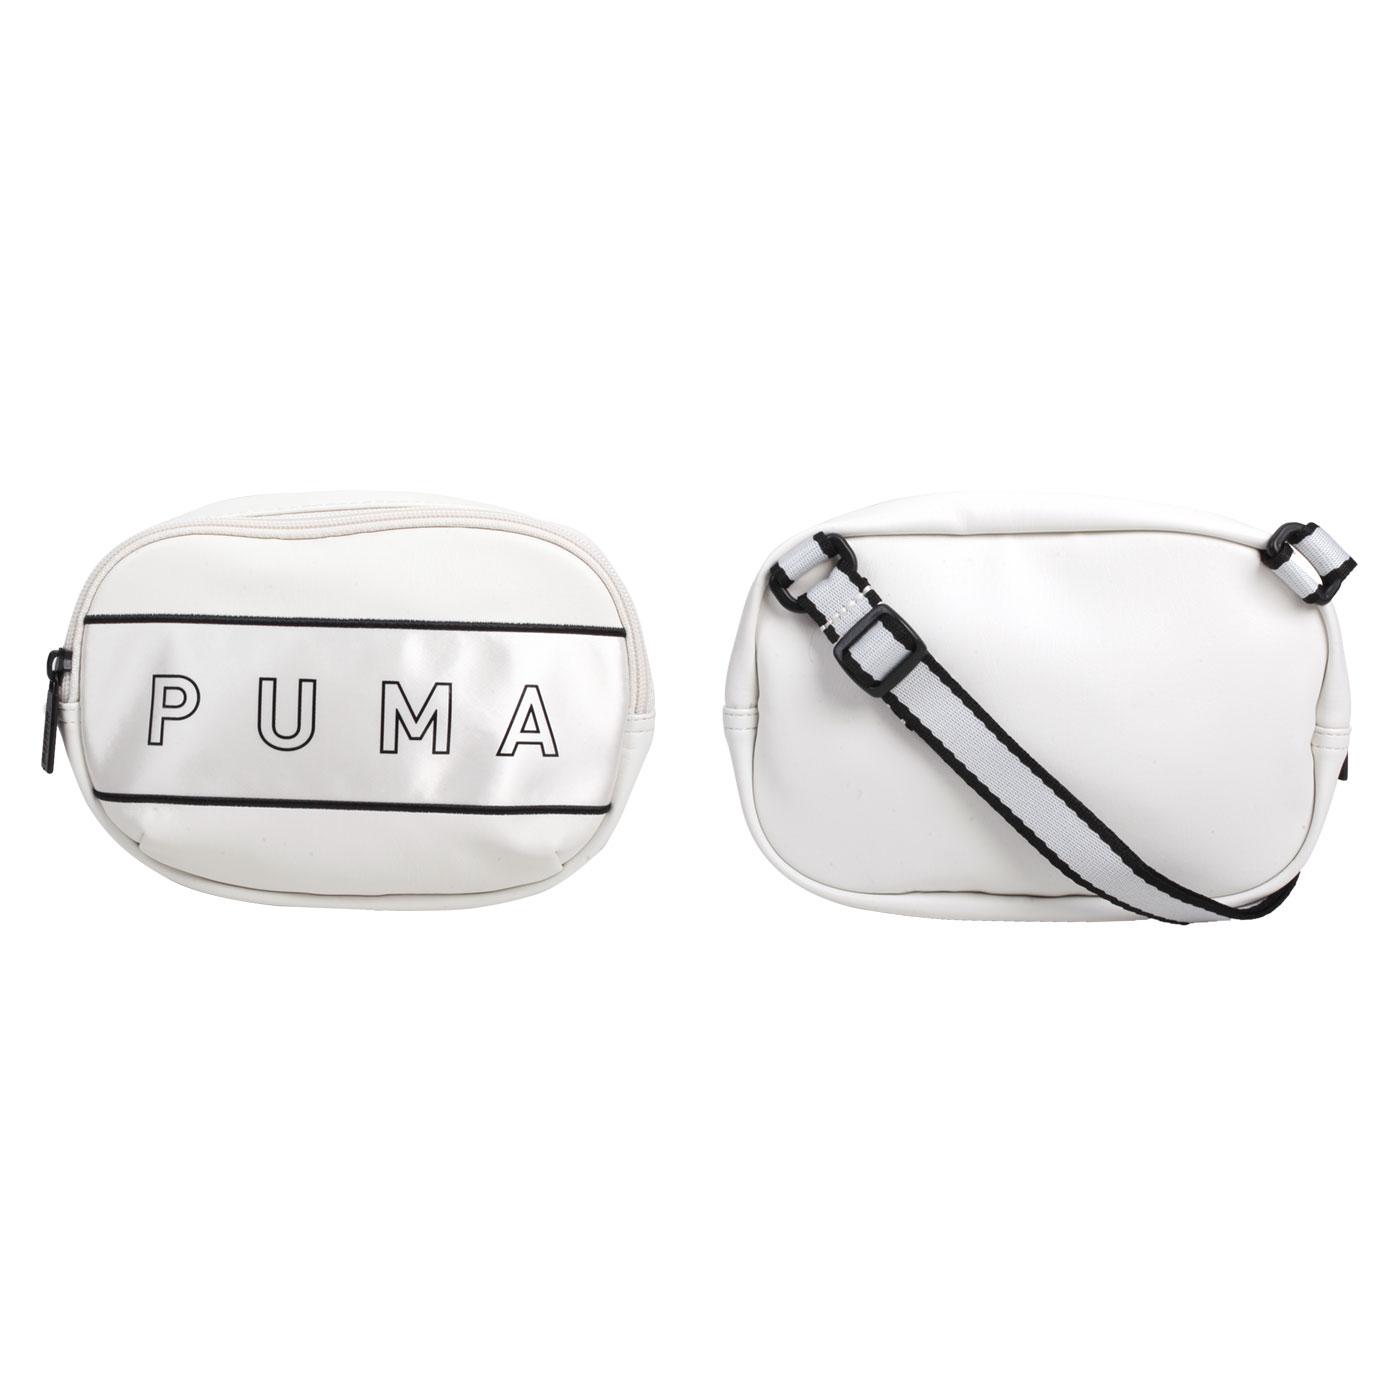 PUMA 側背小包 07739102 - 白黑